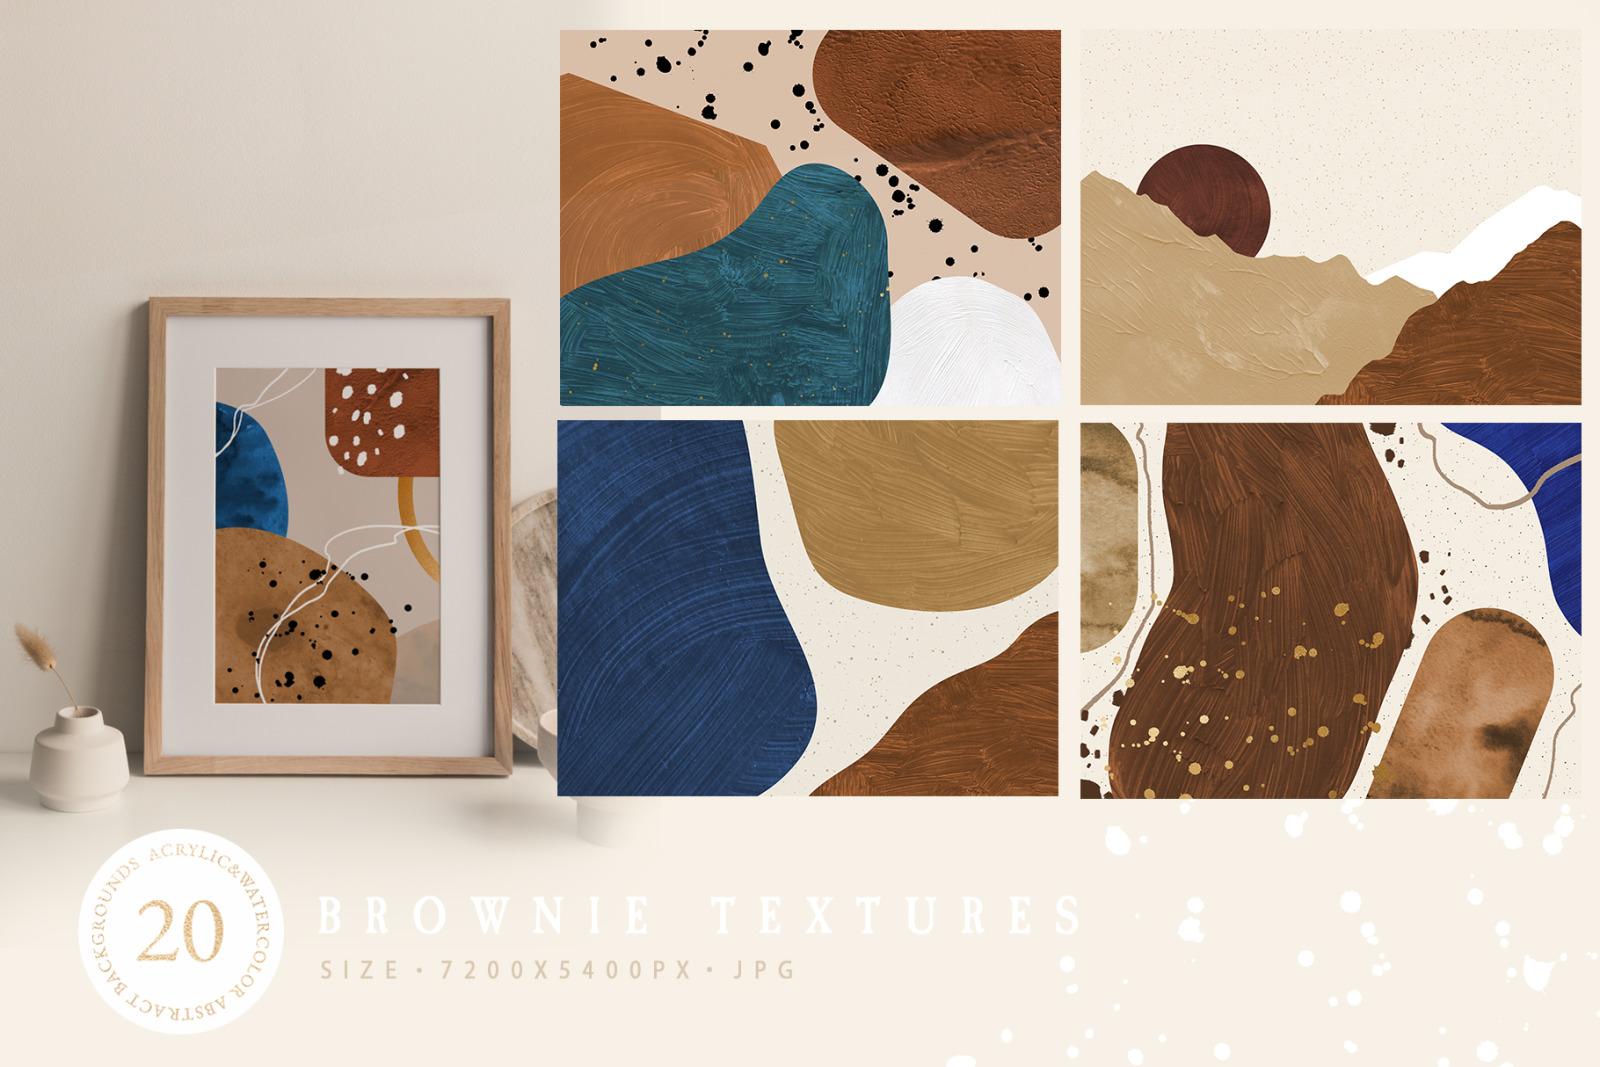 Brownie Invitation Textures